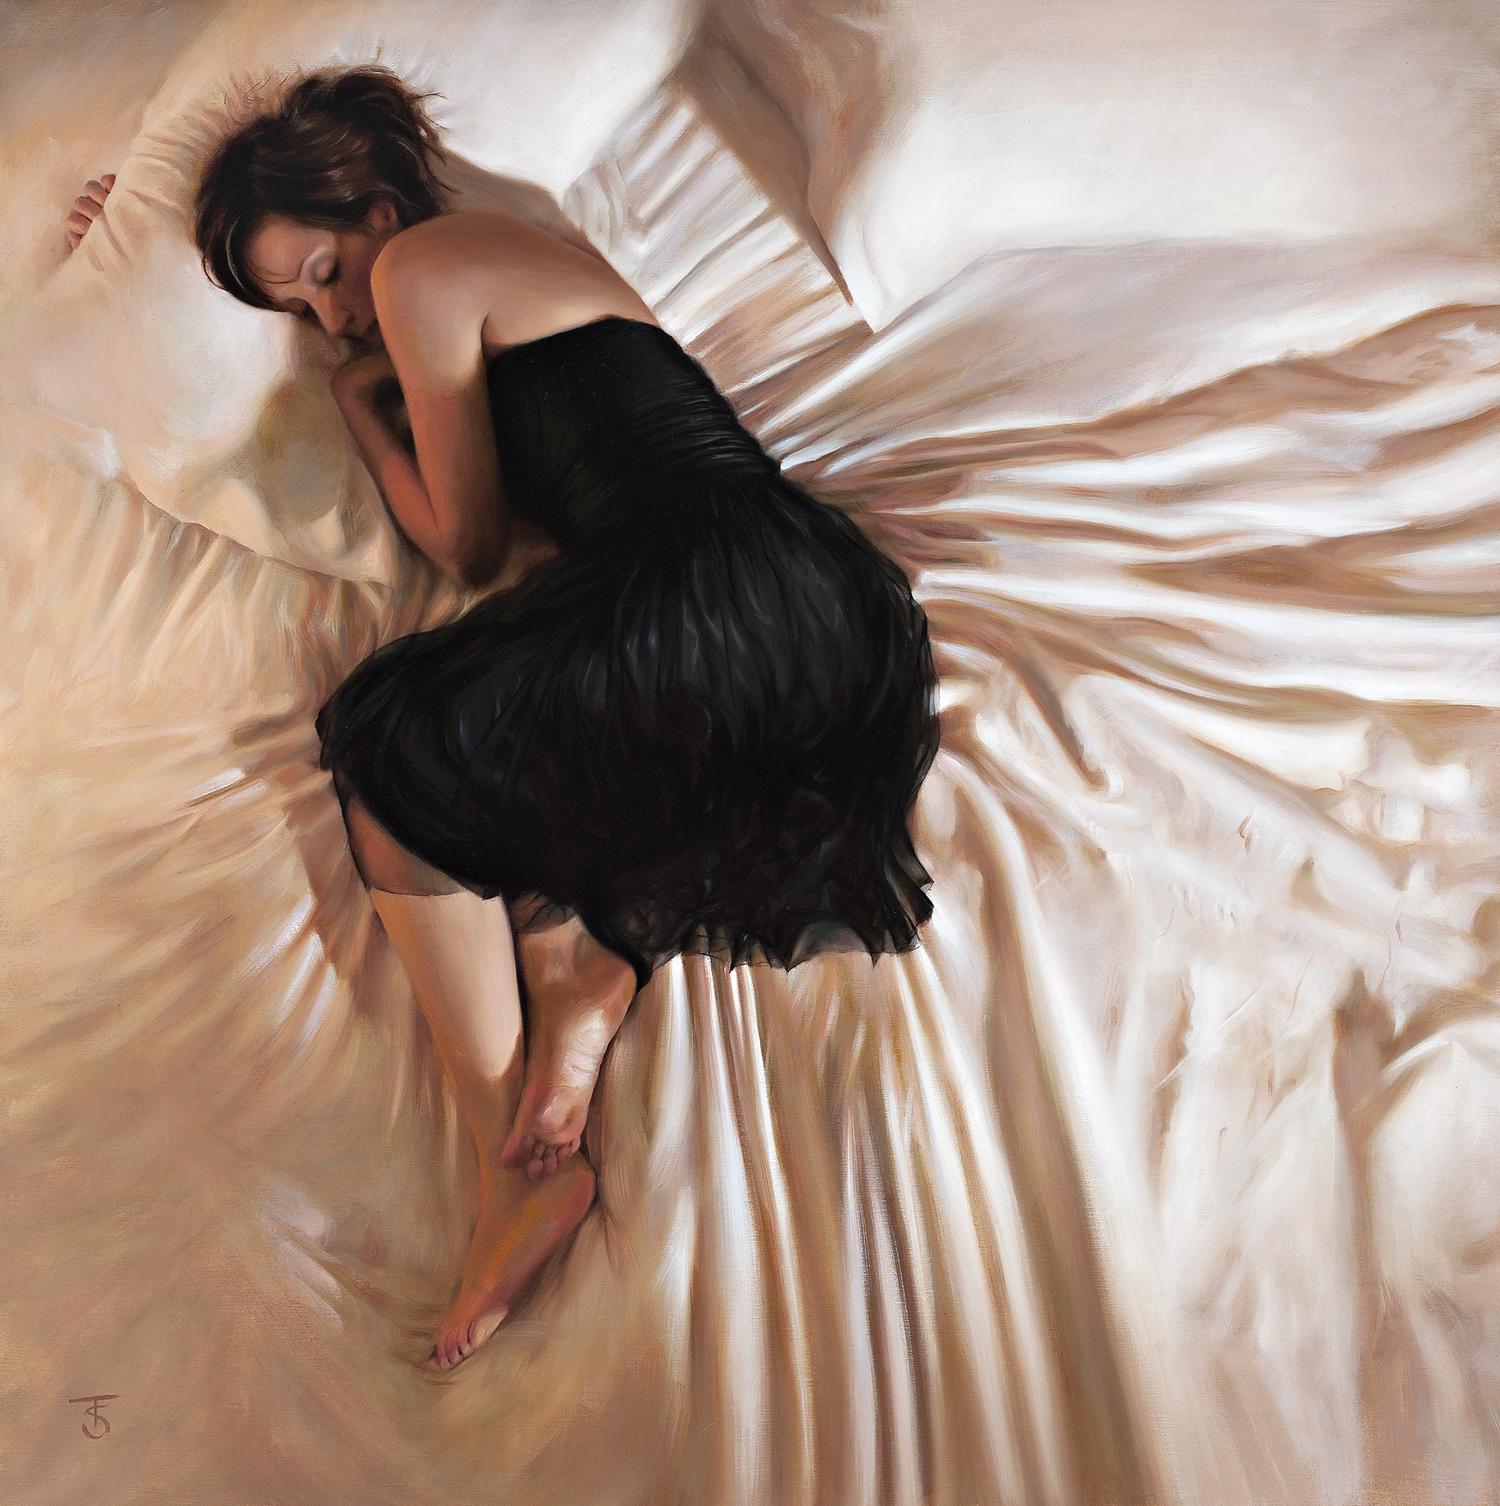 "Black Dress IV Oil on linen, 26"" x 26"" / SOLD"